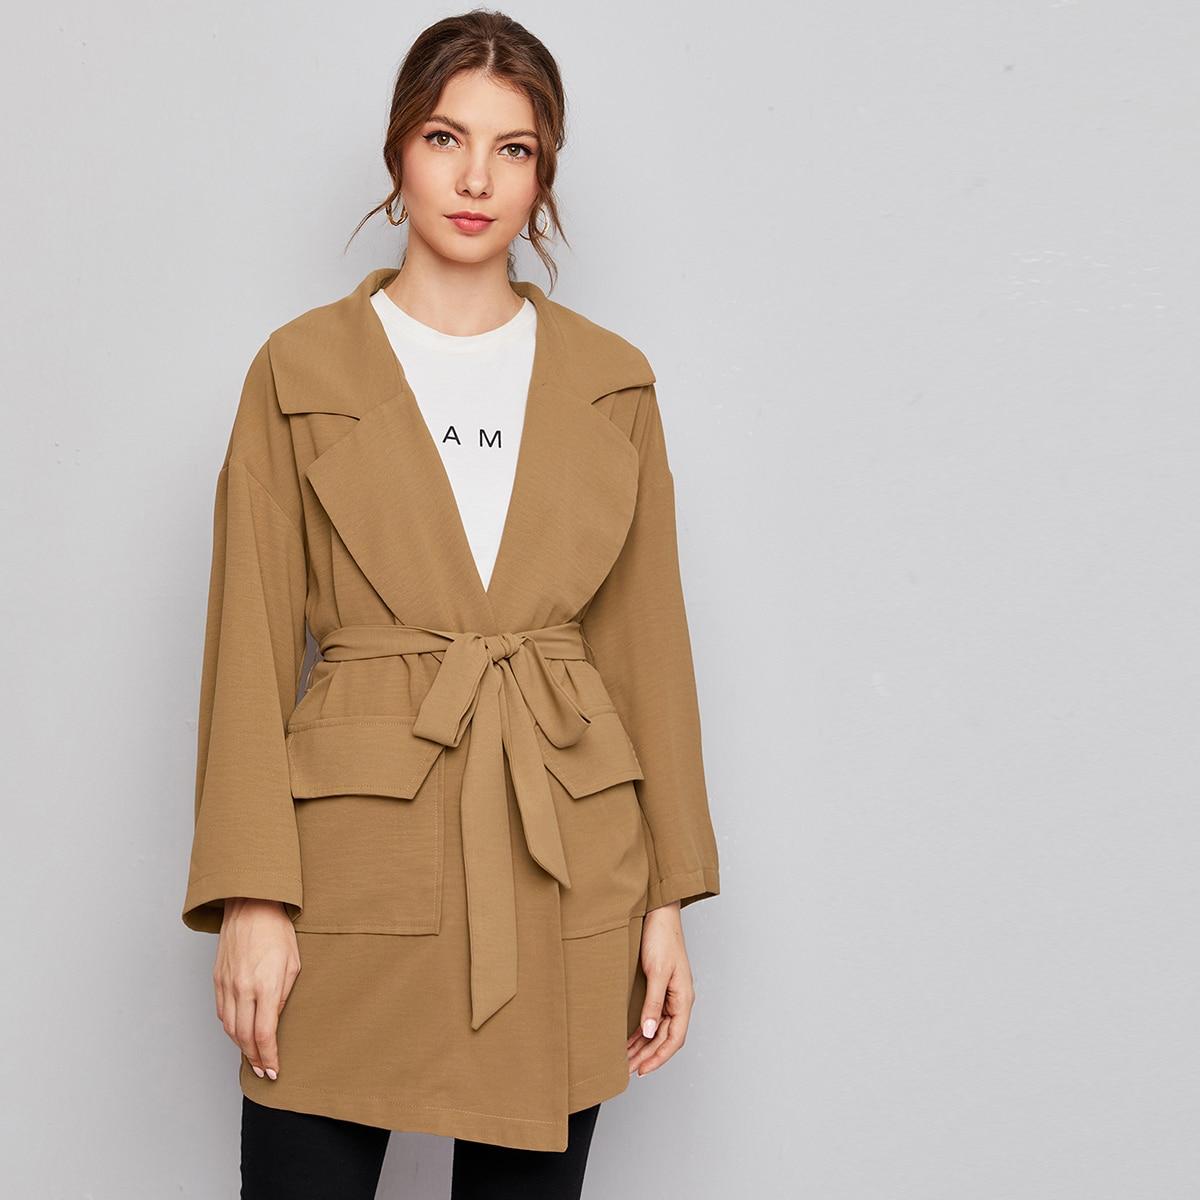 Notched Collar Flap Pocket Front Self Belted Coat